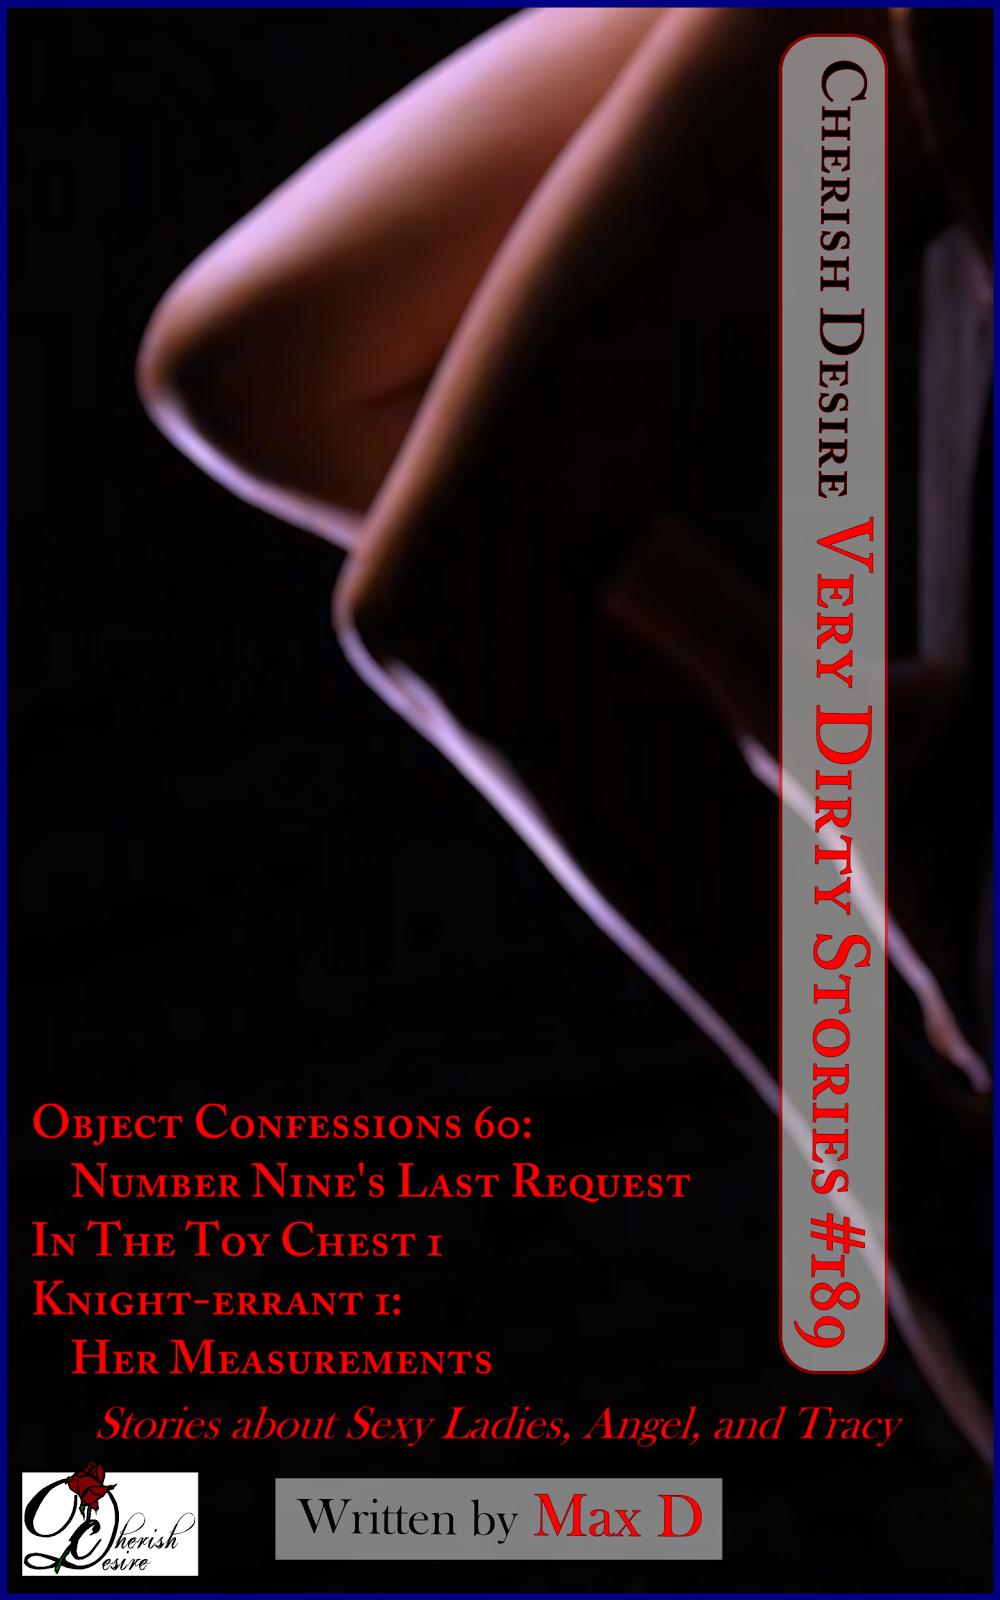 Cherish Desire: Very Dirty Stories #189, Max D, erotica